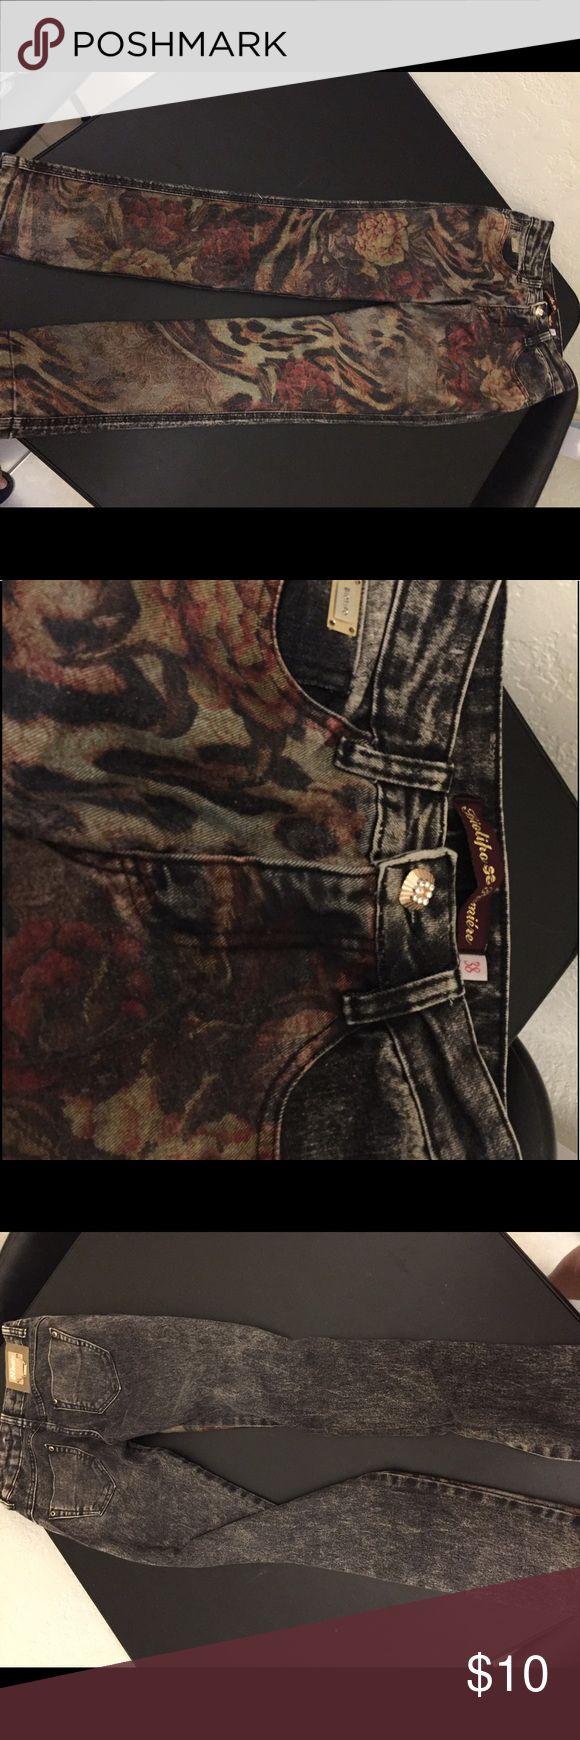 Black skinny jeans Brazilian brand Biotipo Never worn printed like the pics Jeans Skinny